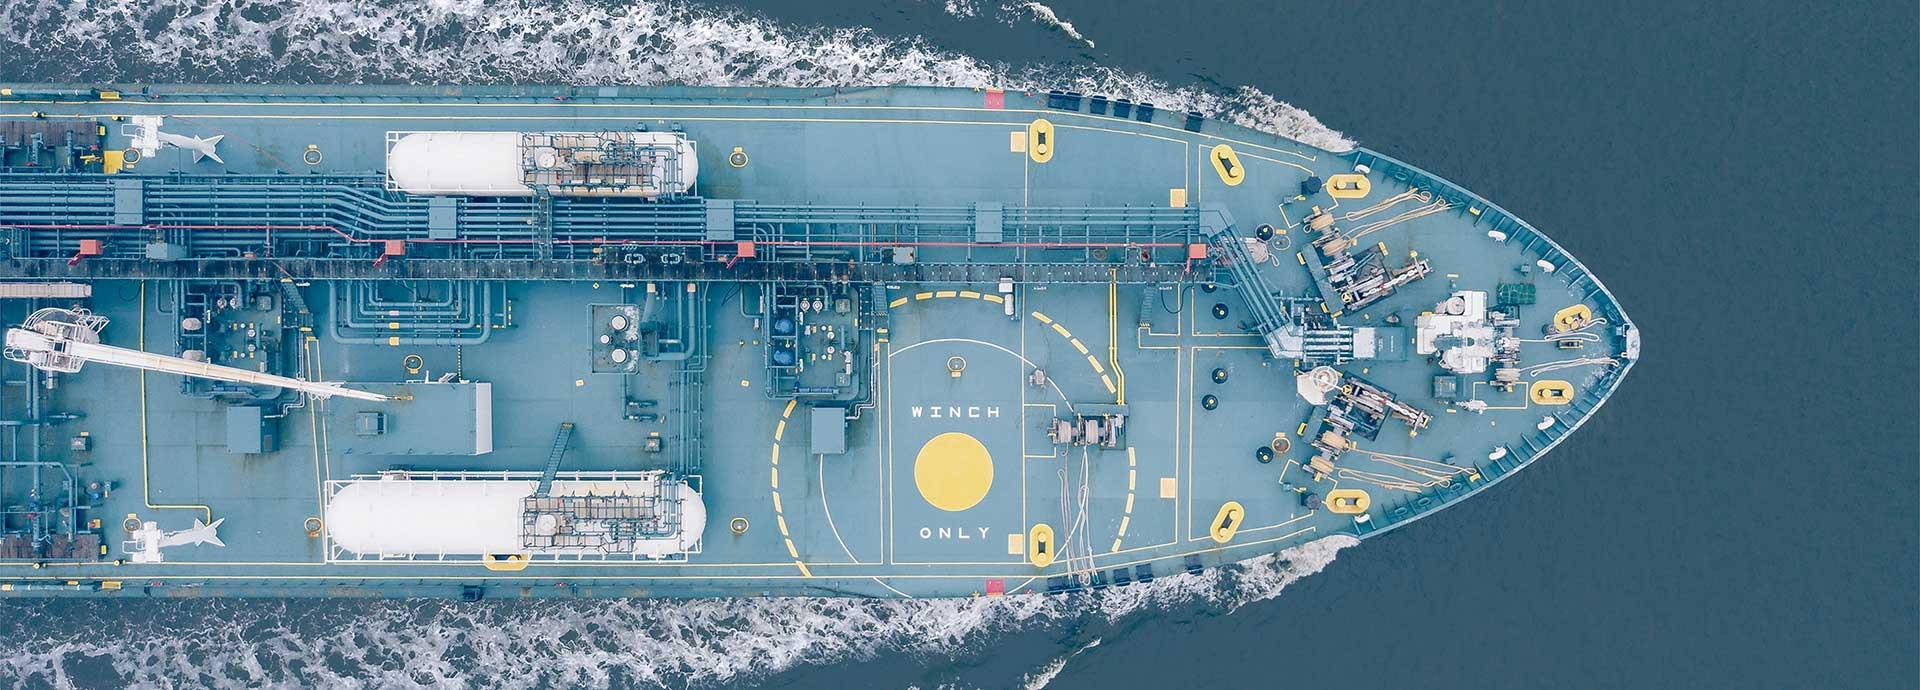 Poseidon Principles use finance to take on global emissions